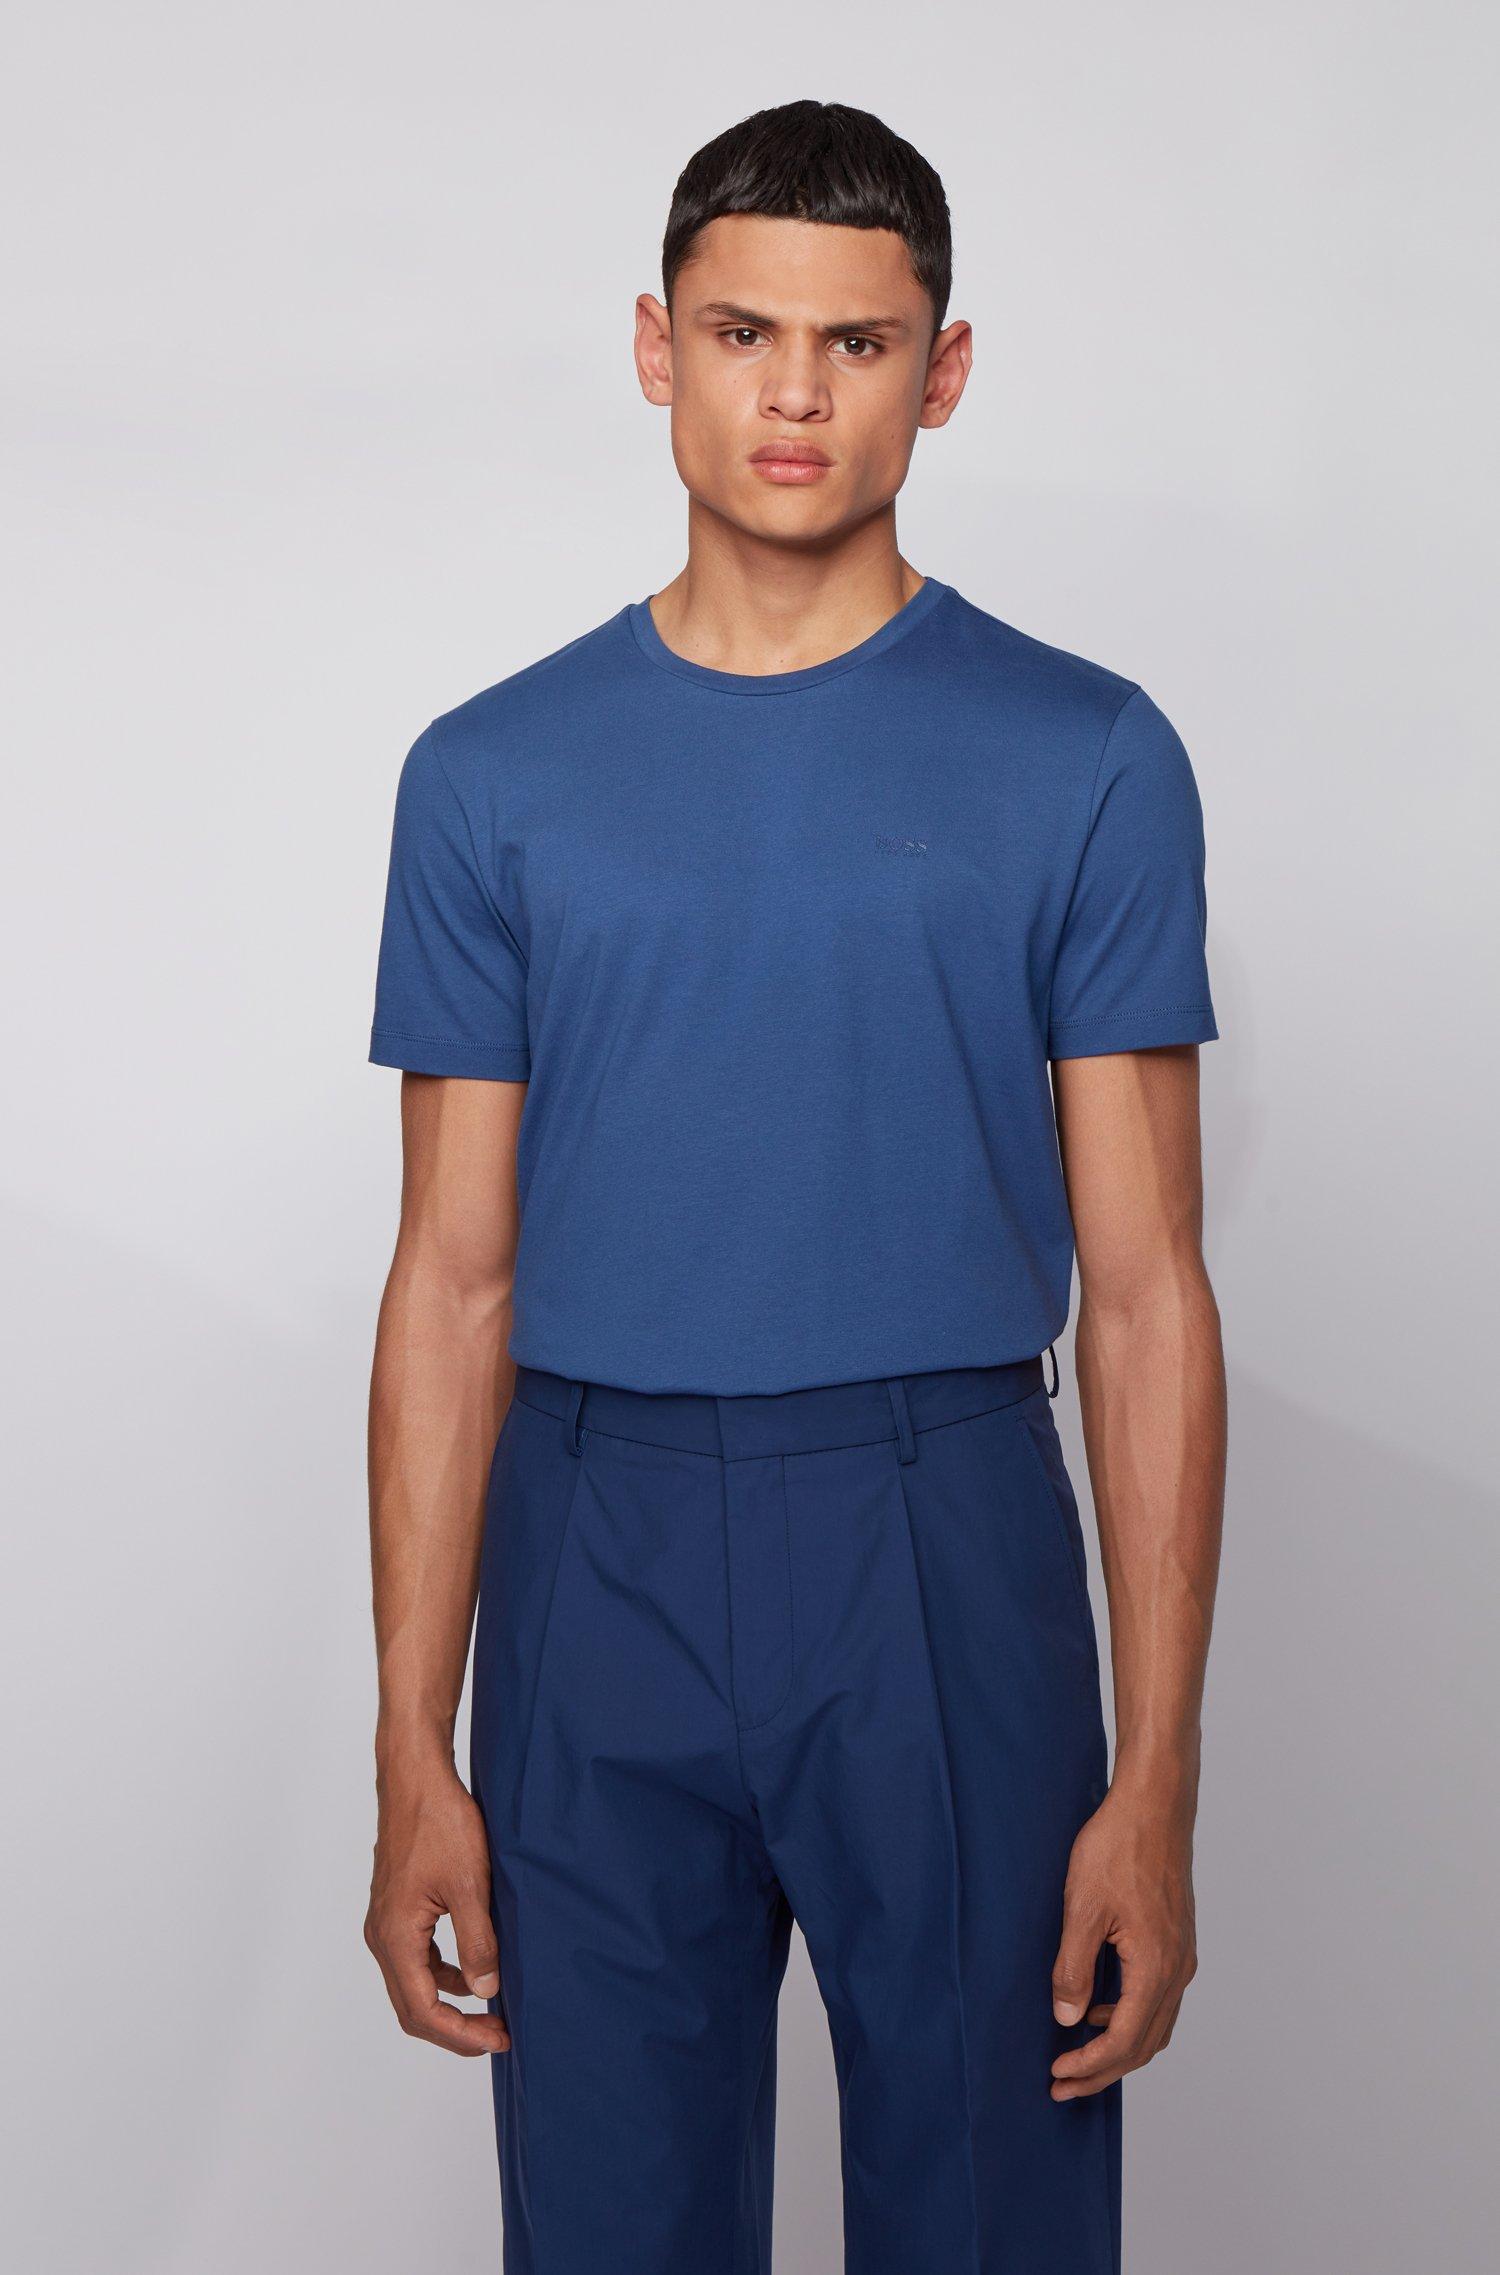 Crew-neck T-shirt in yarn-dyed single jersey, Light Blue